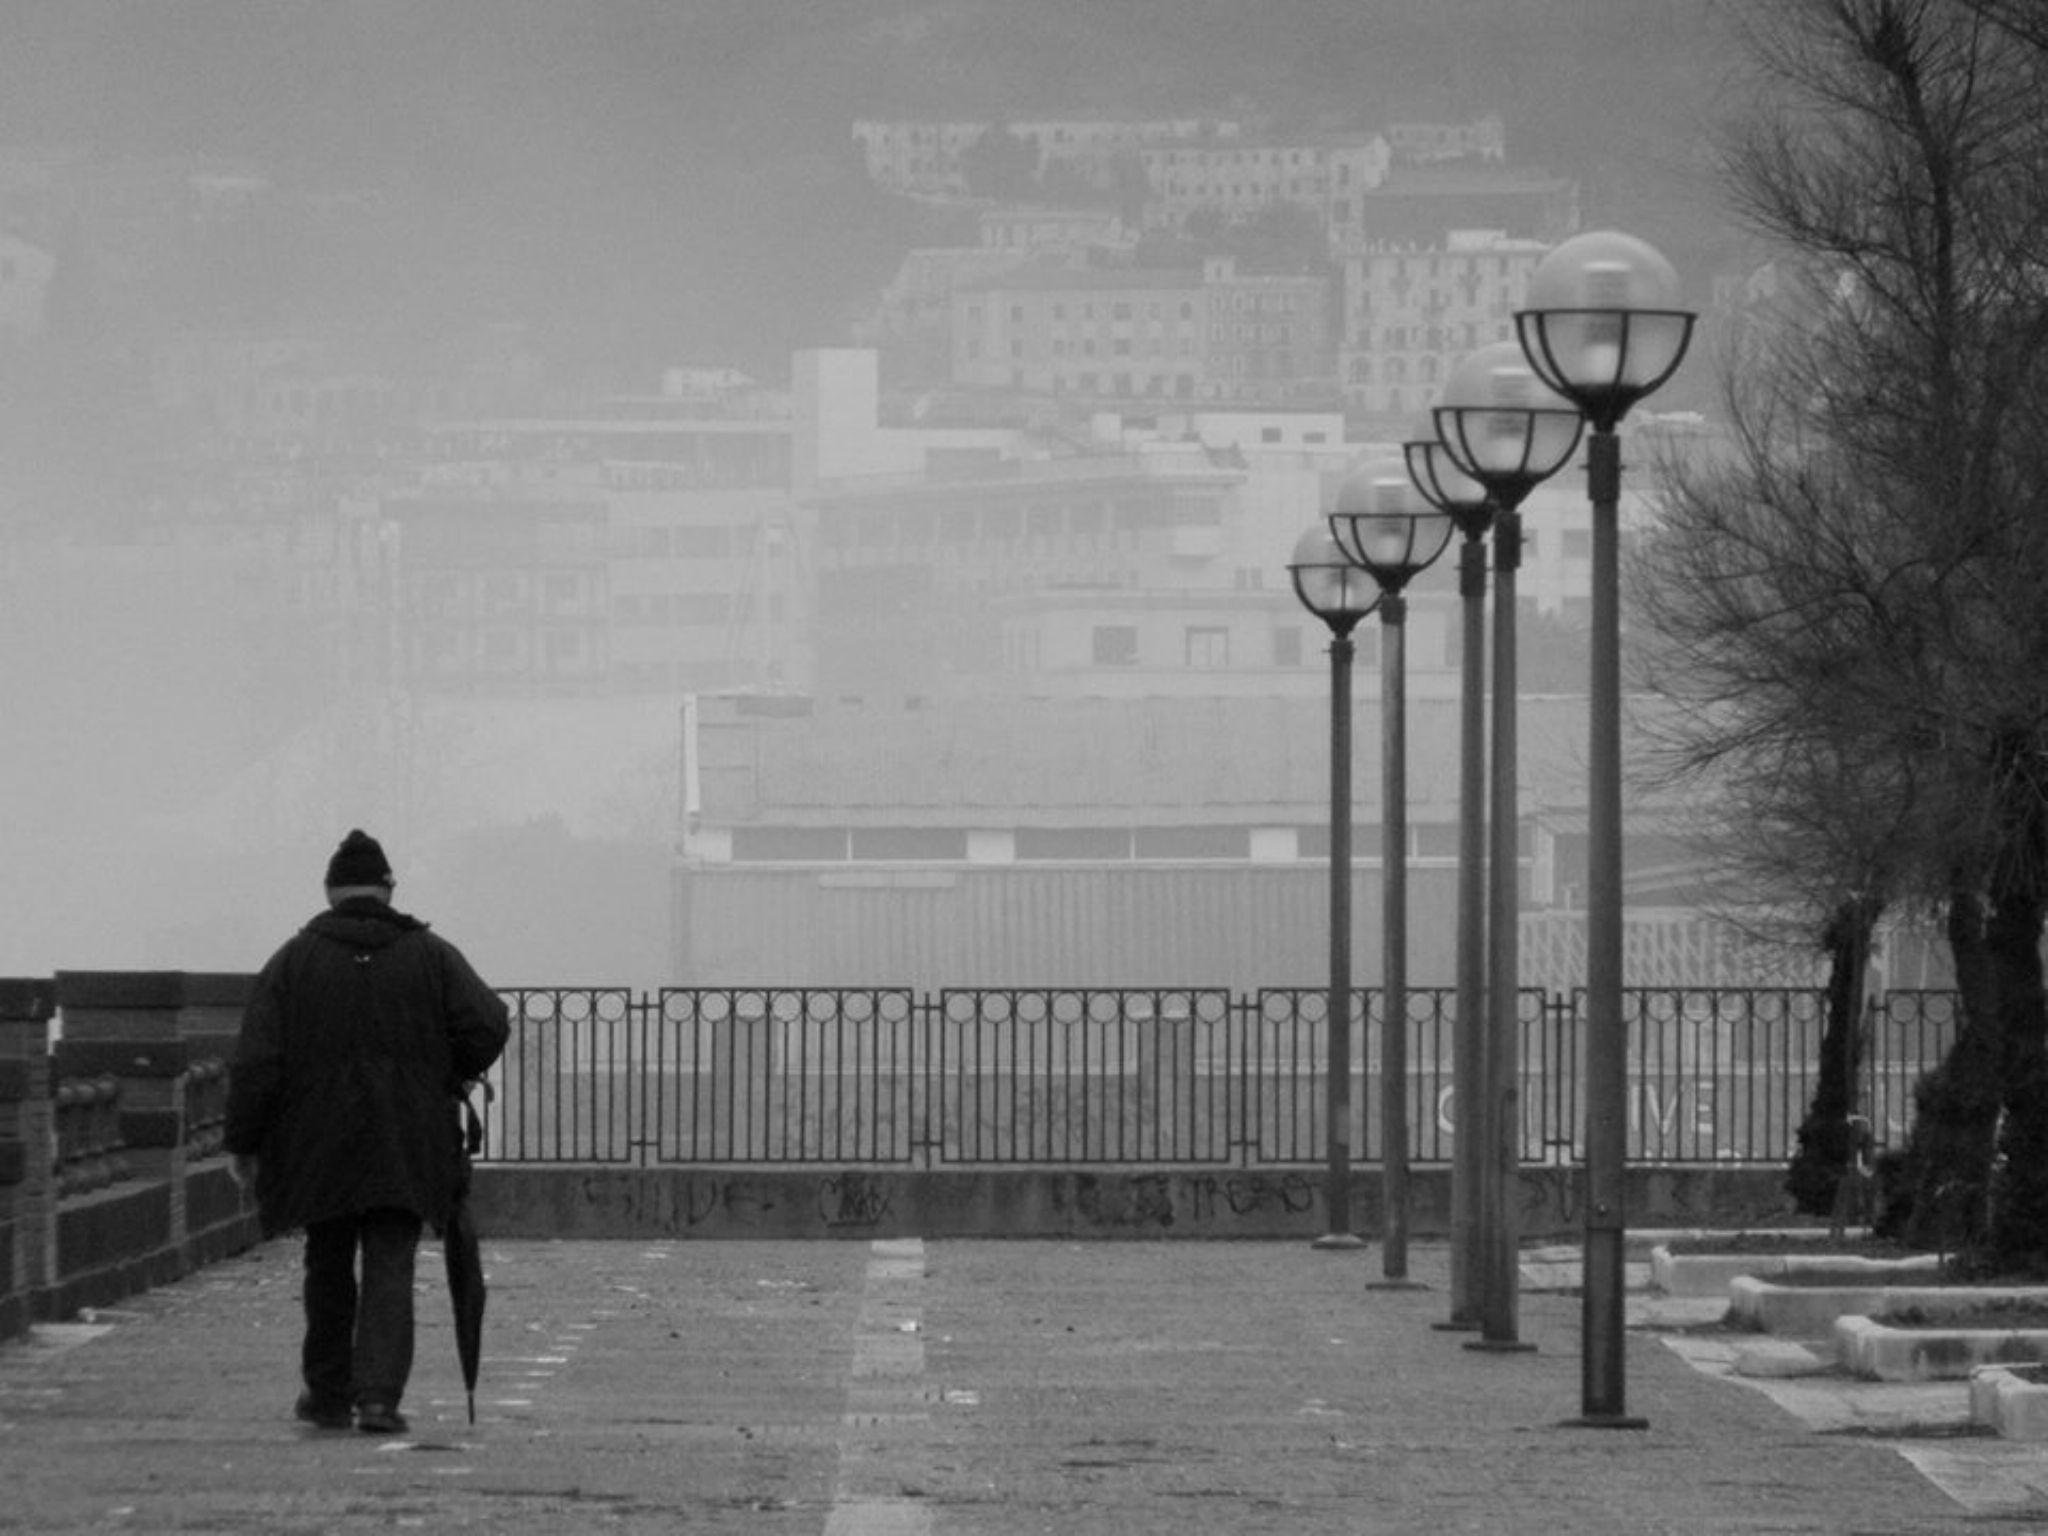 21 January 2014 by Margarita Gjeta